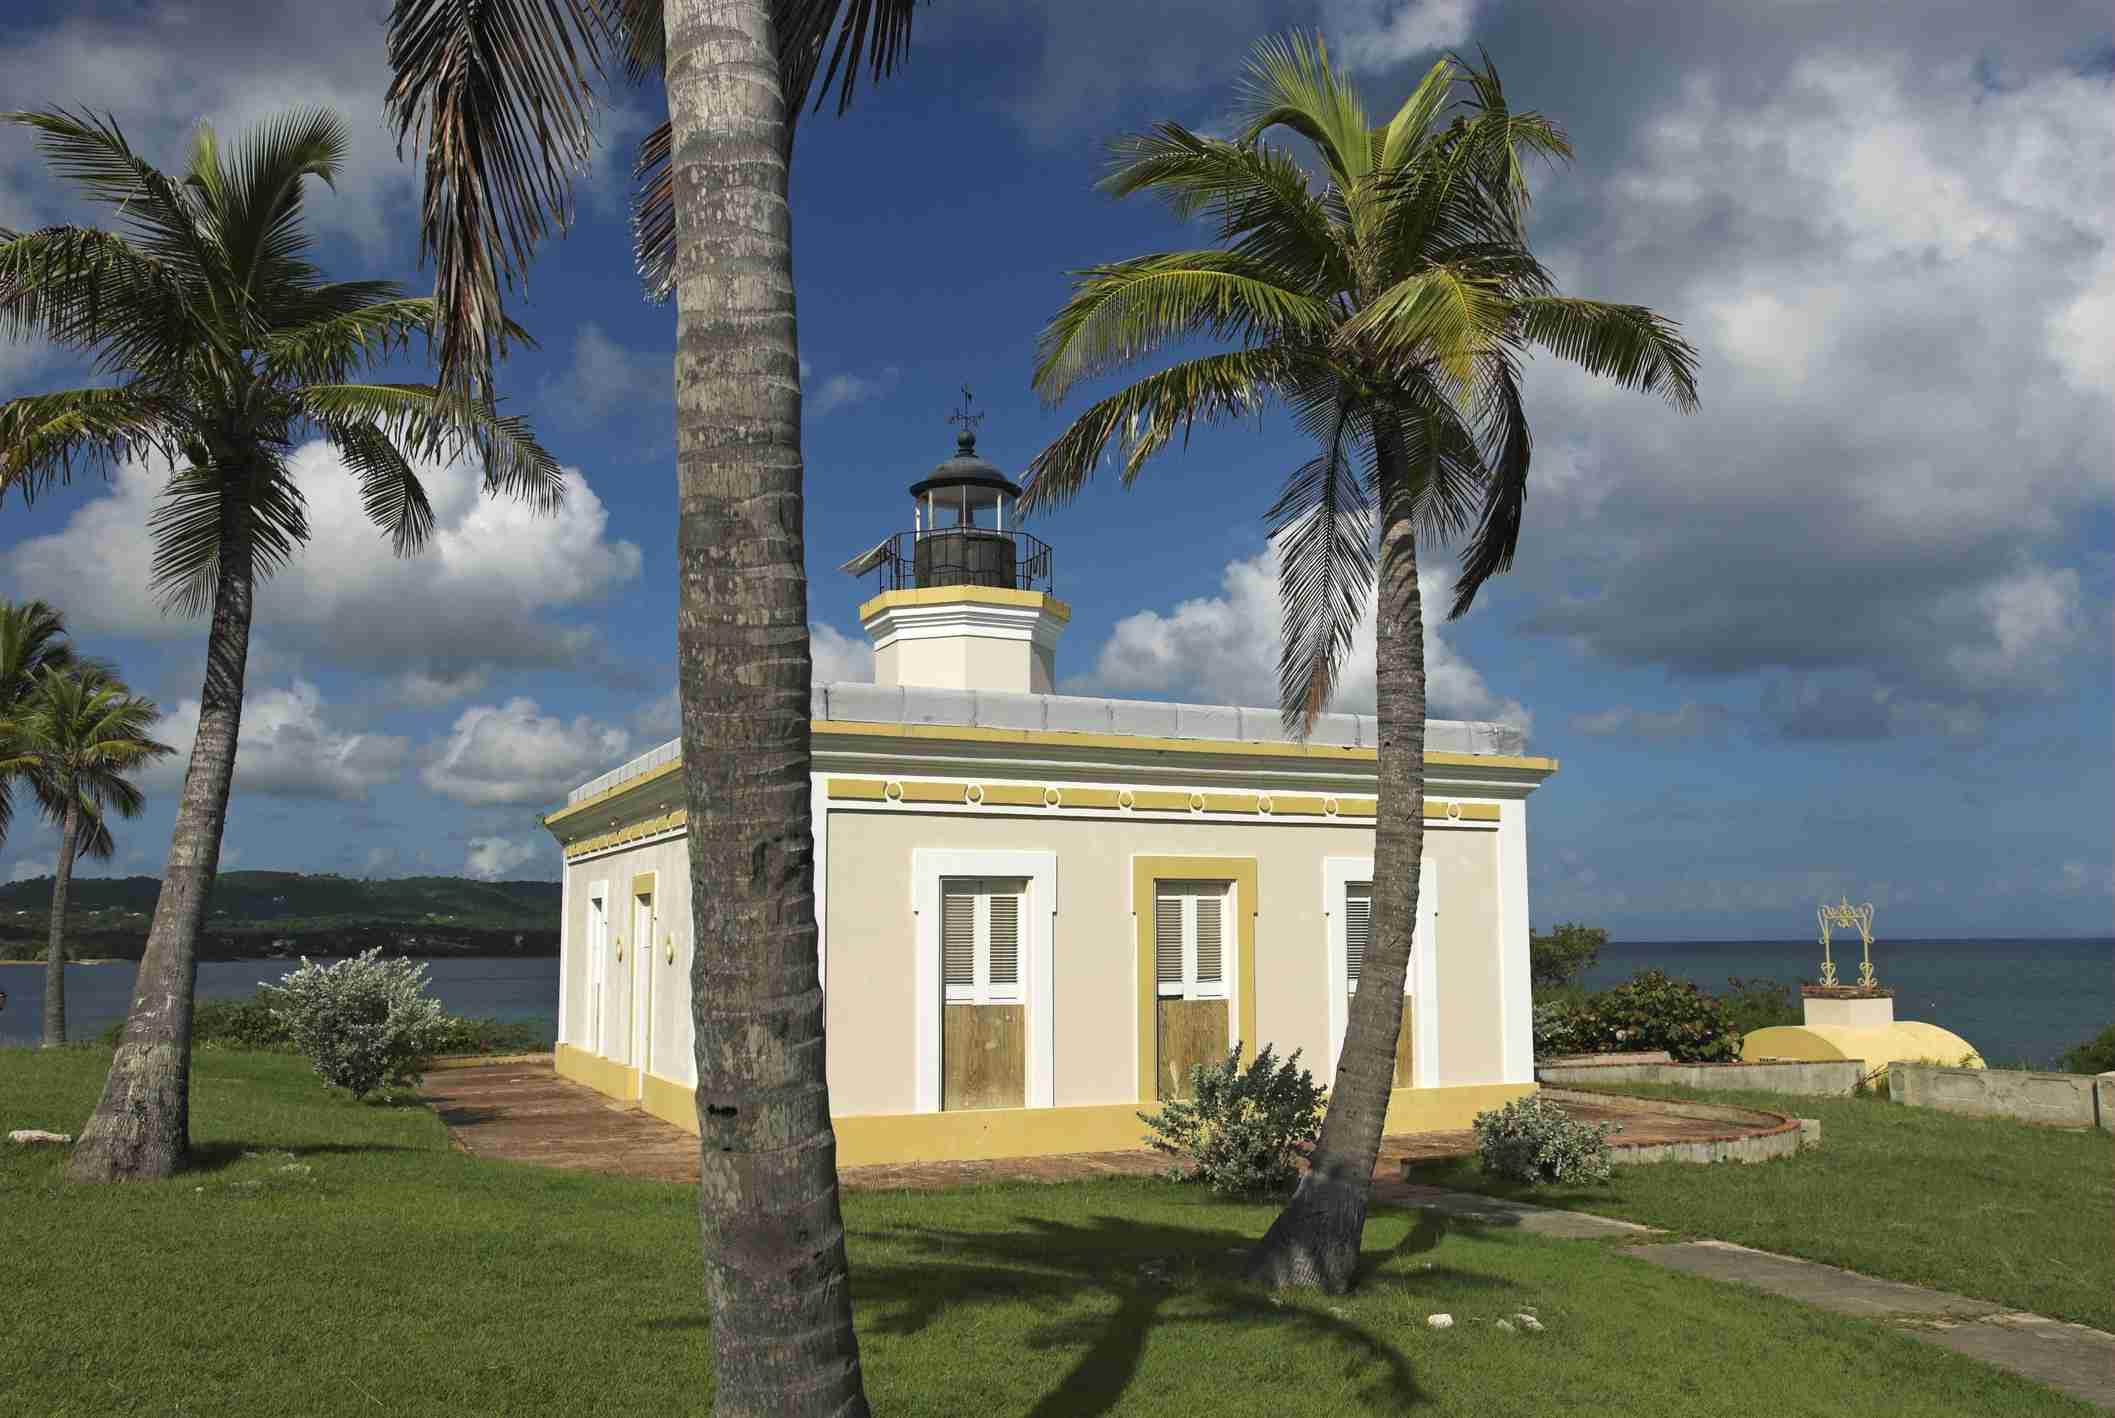 Lighthouse Faro de Punta Mulas in Isabel Segunda, Vieques island, Puerto Rico